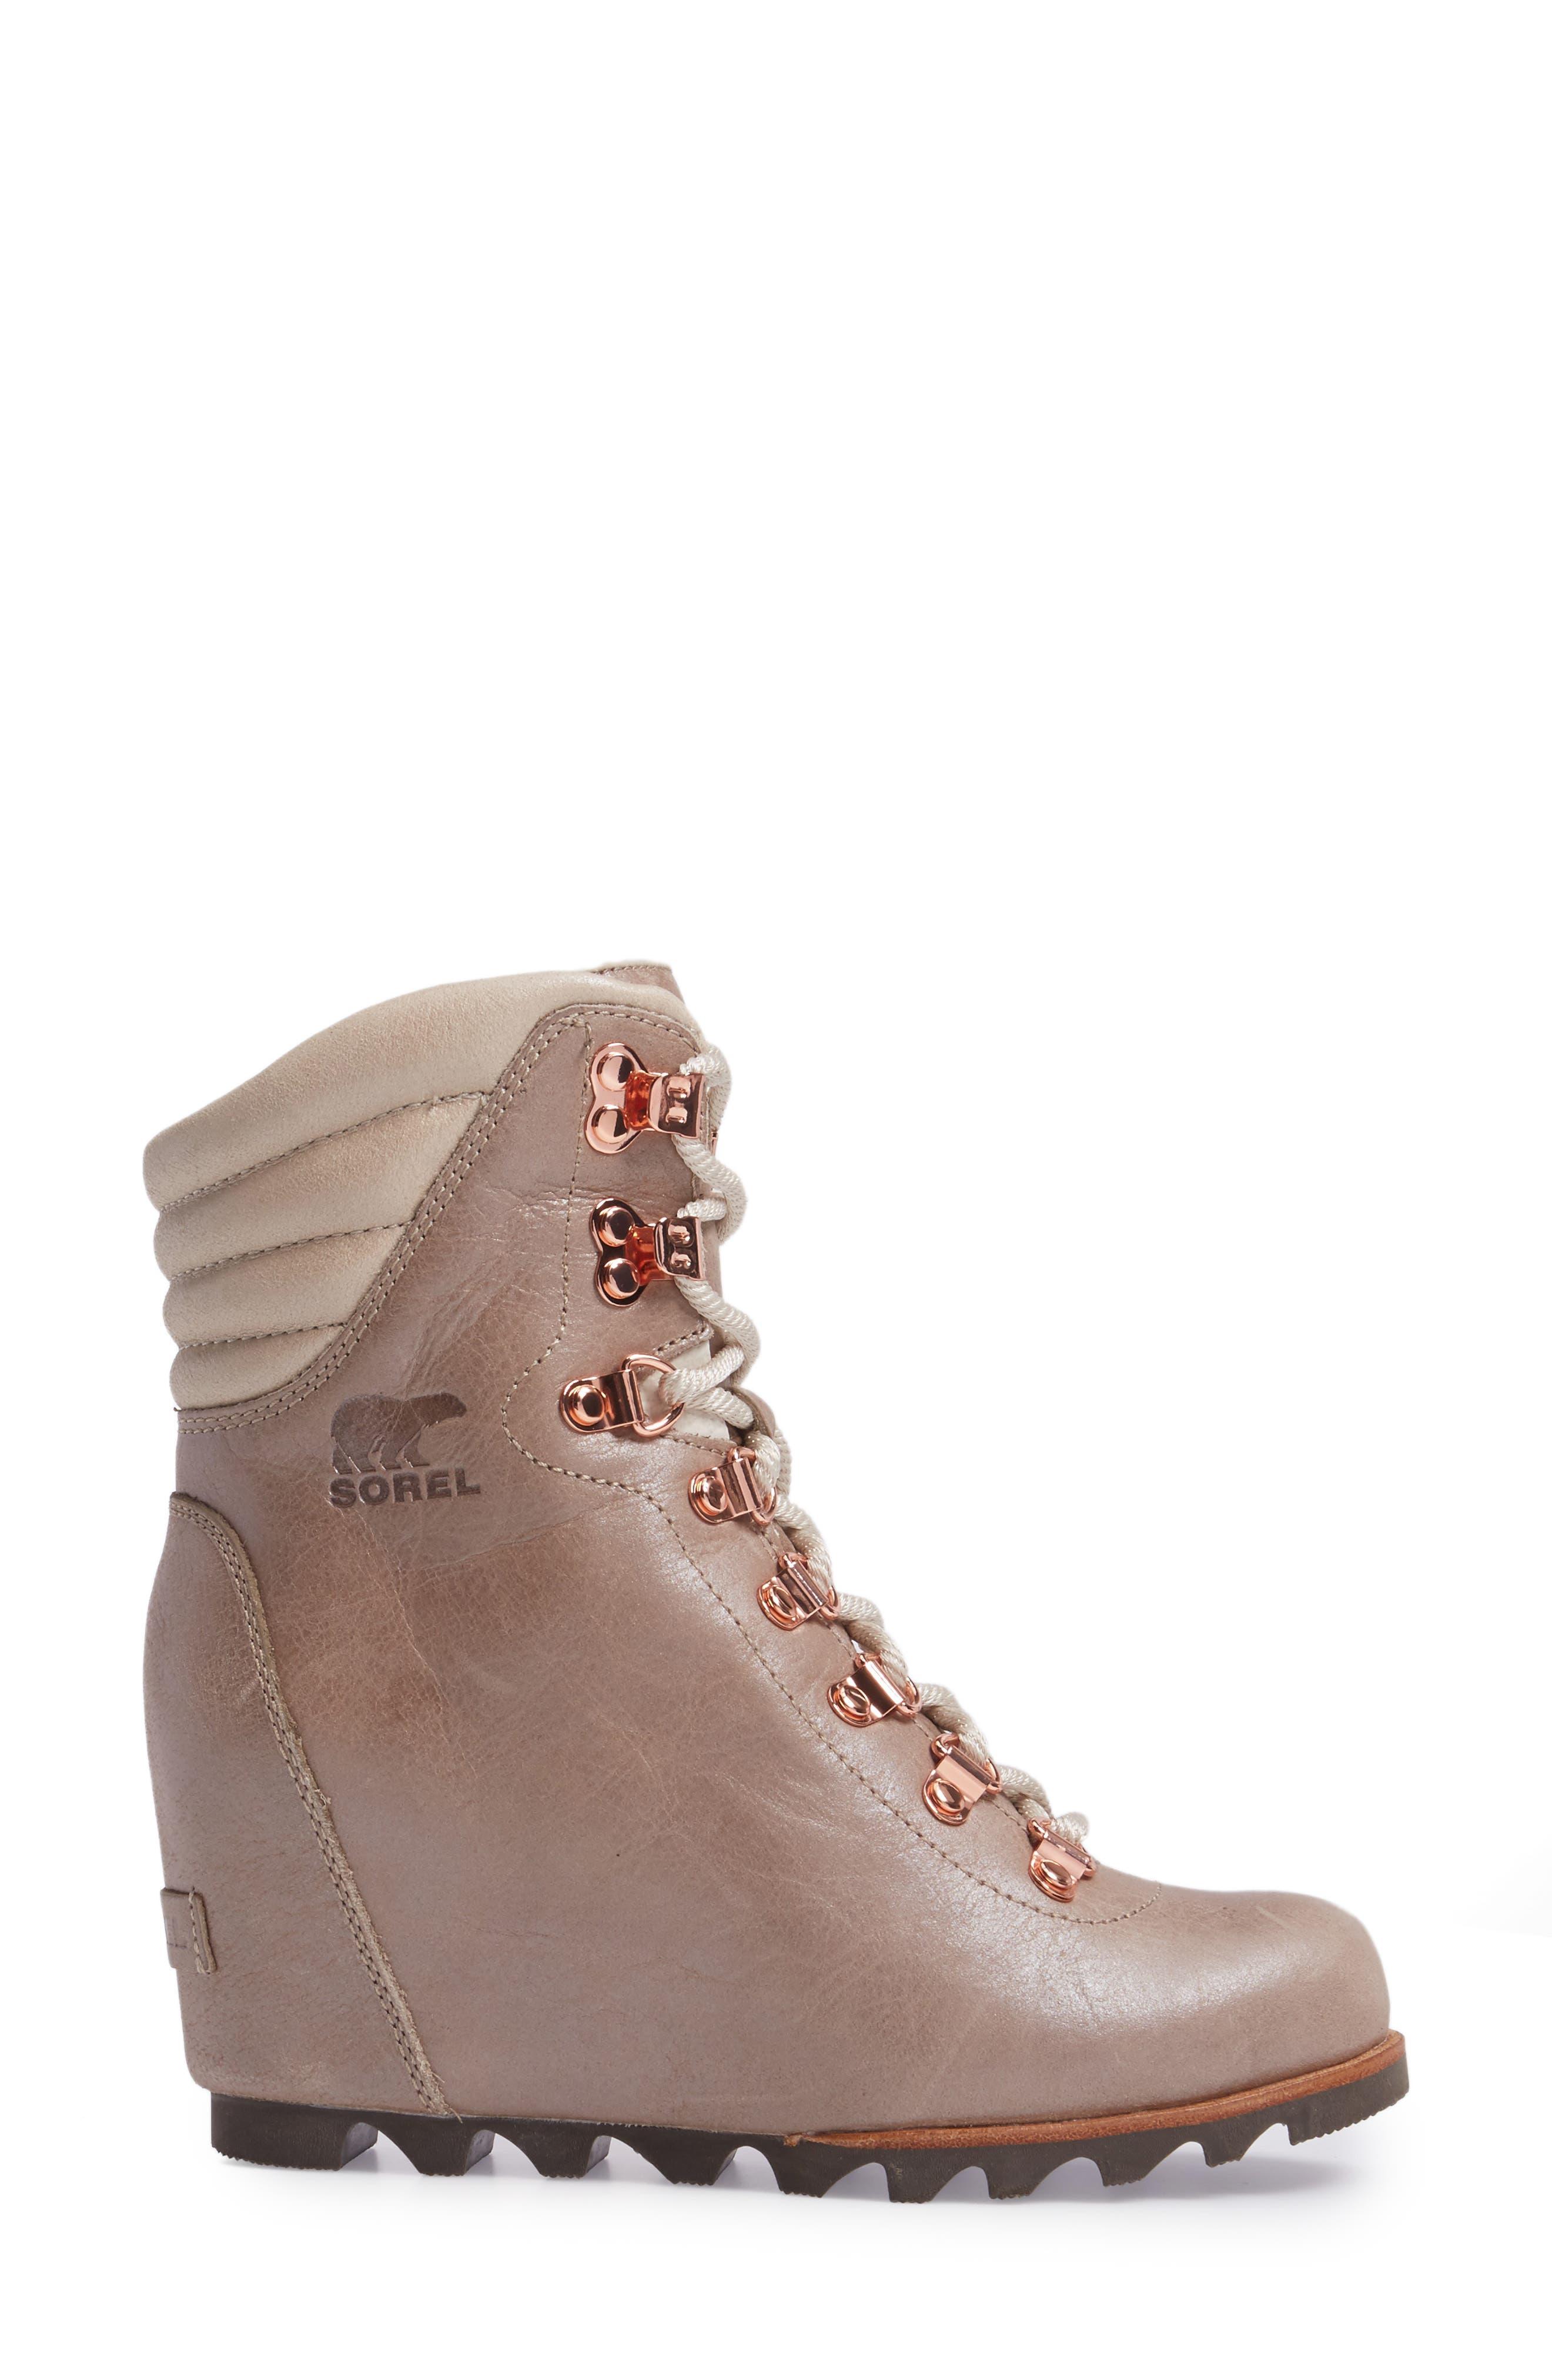 Alternate Image 3  - SOREL 'Conquest' Waterproof Wedge Boot (Women)